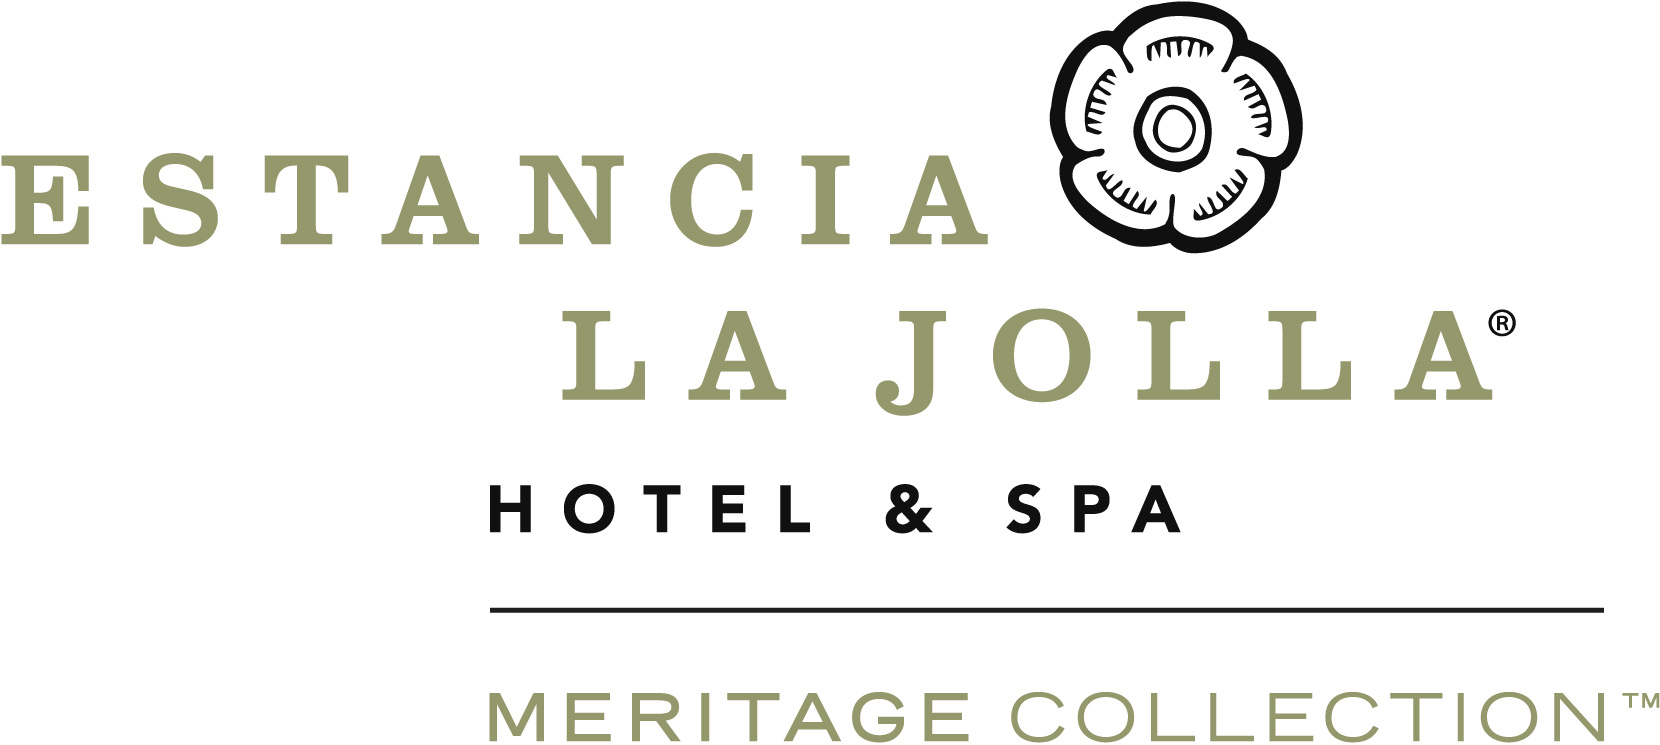 Estancia La Jolla Hotel & Spa logo